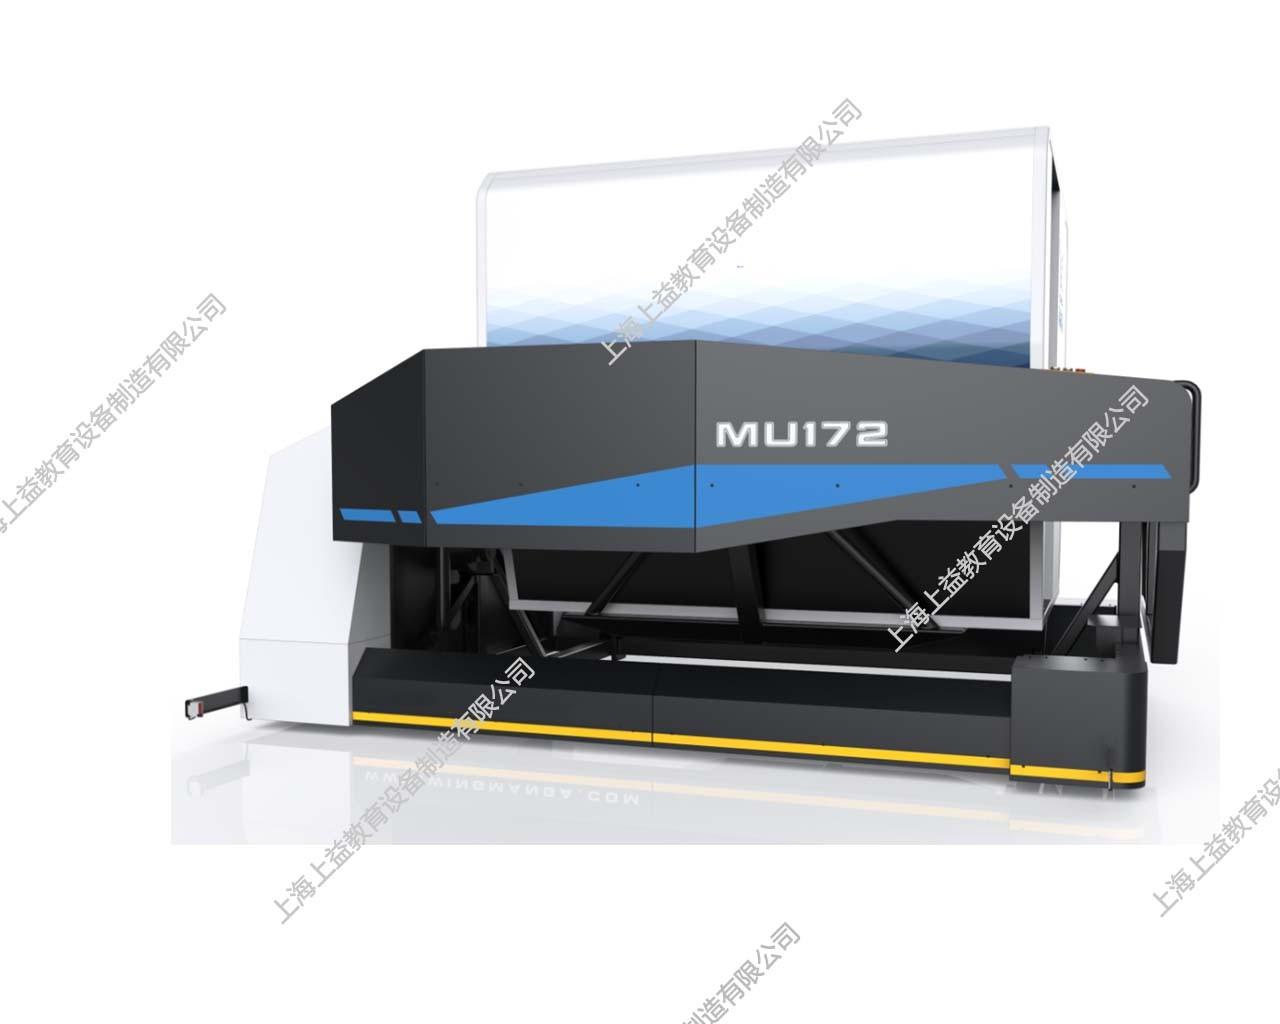 MU172白鹭乐虎国际手机客户端App全动模拟器